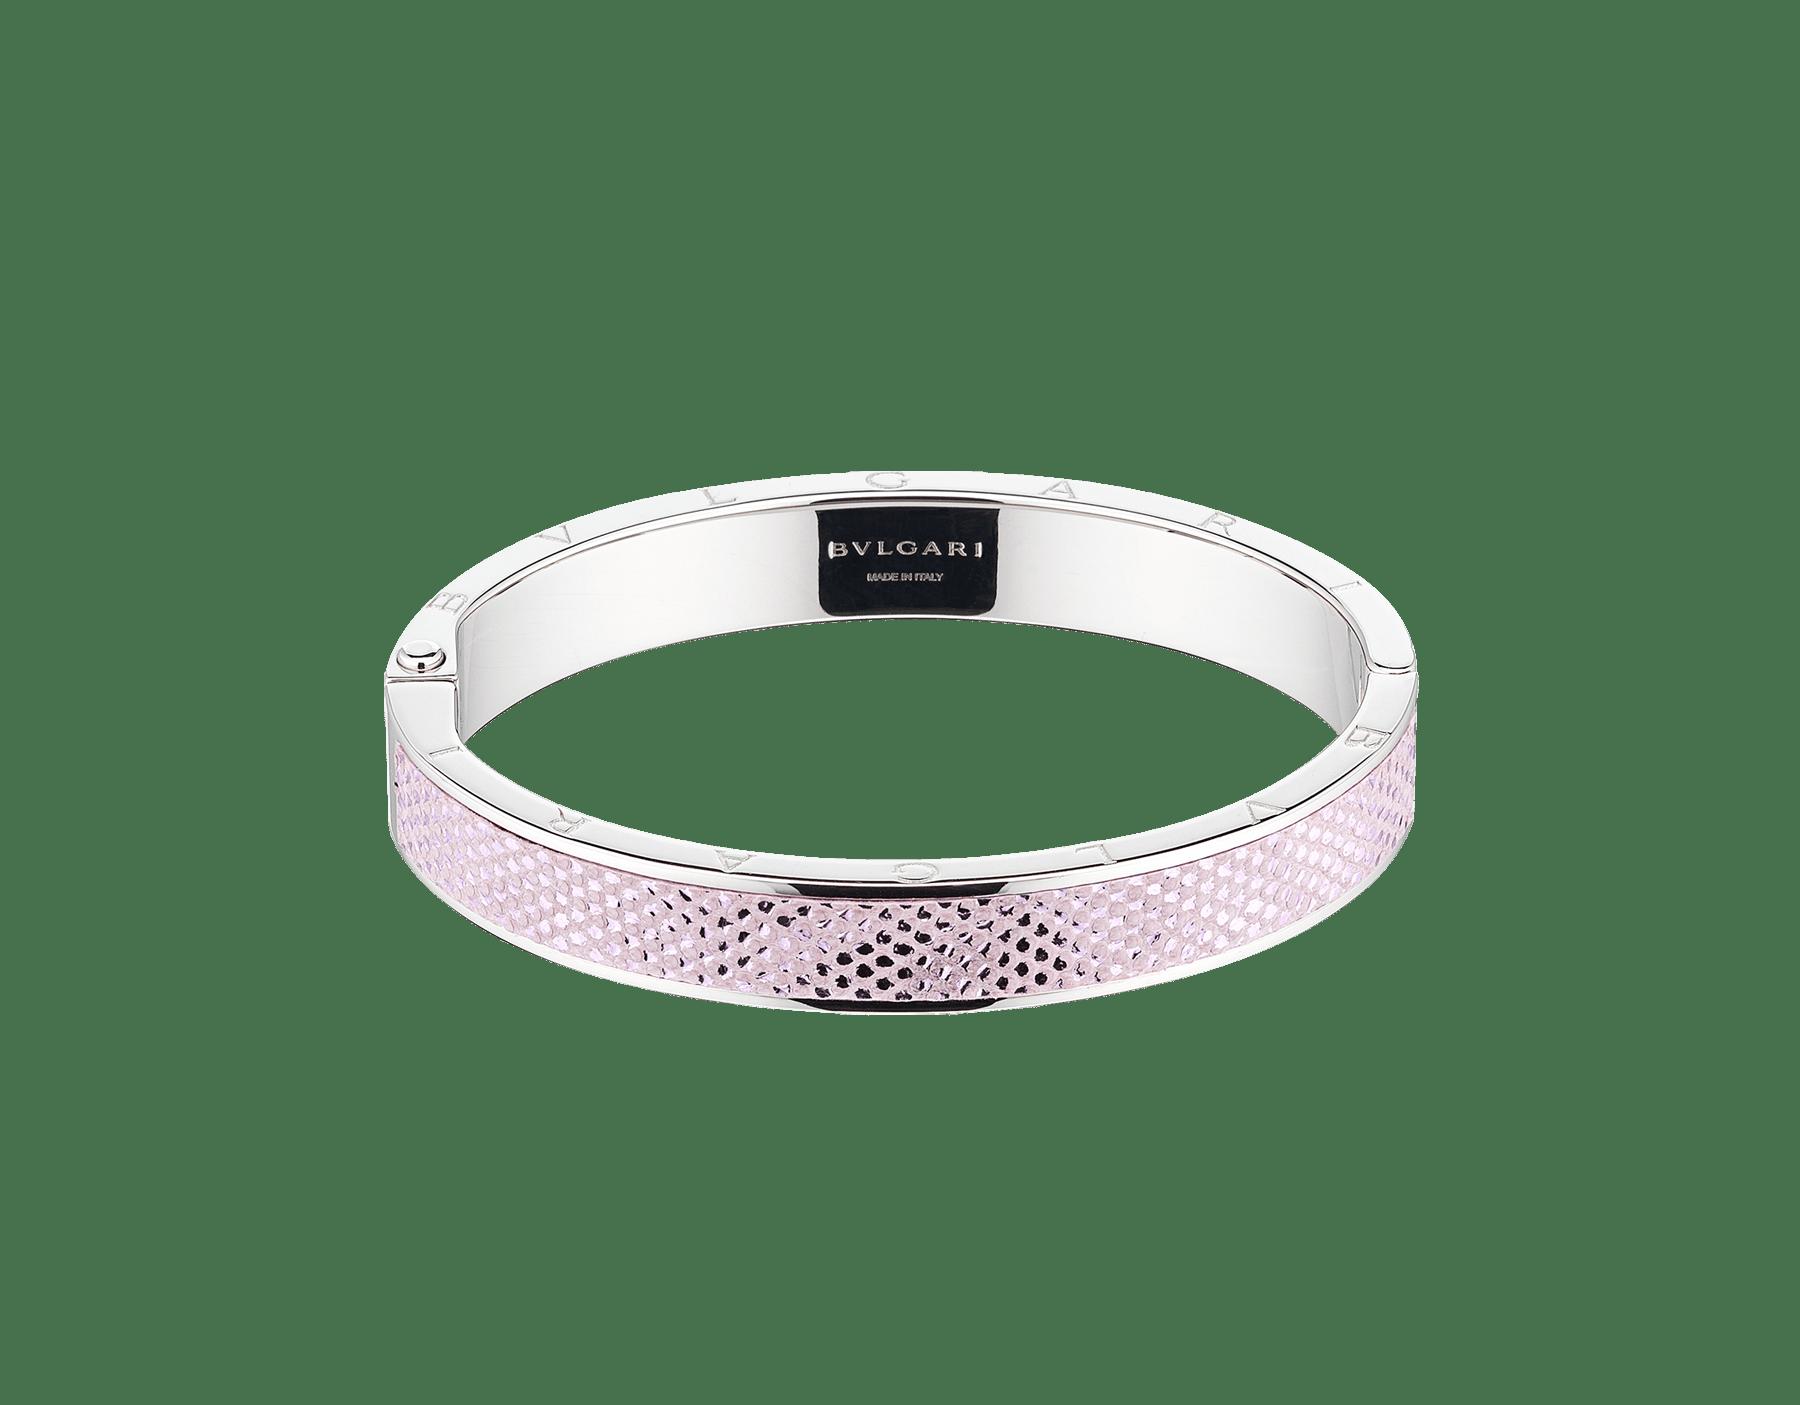 """BVLGARI BVLGARI"" bangle bracelet in palladium-plated brass with a Rosa di Francia pink metallic karung skin insert and a BVLGARI logo hinge closure. Logo engraving along the edges of both sides of the bracelet and in the inner part. HINGELOGOBRACLT-MK-RdF image 2"